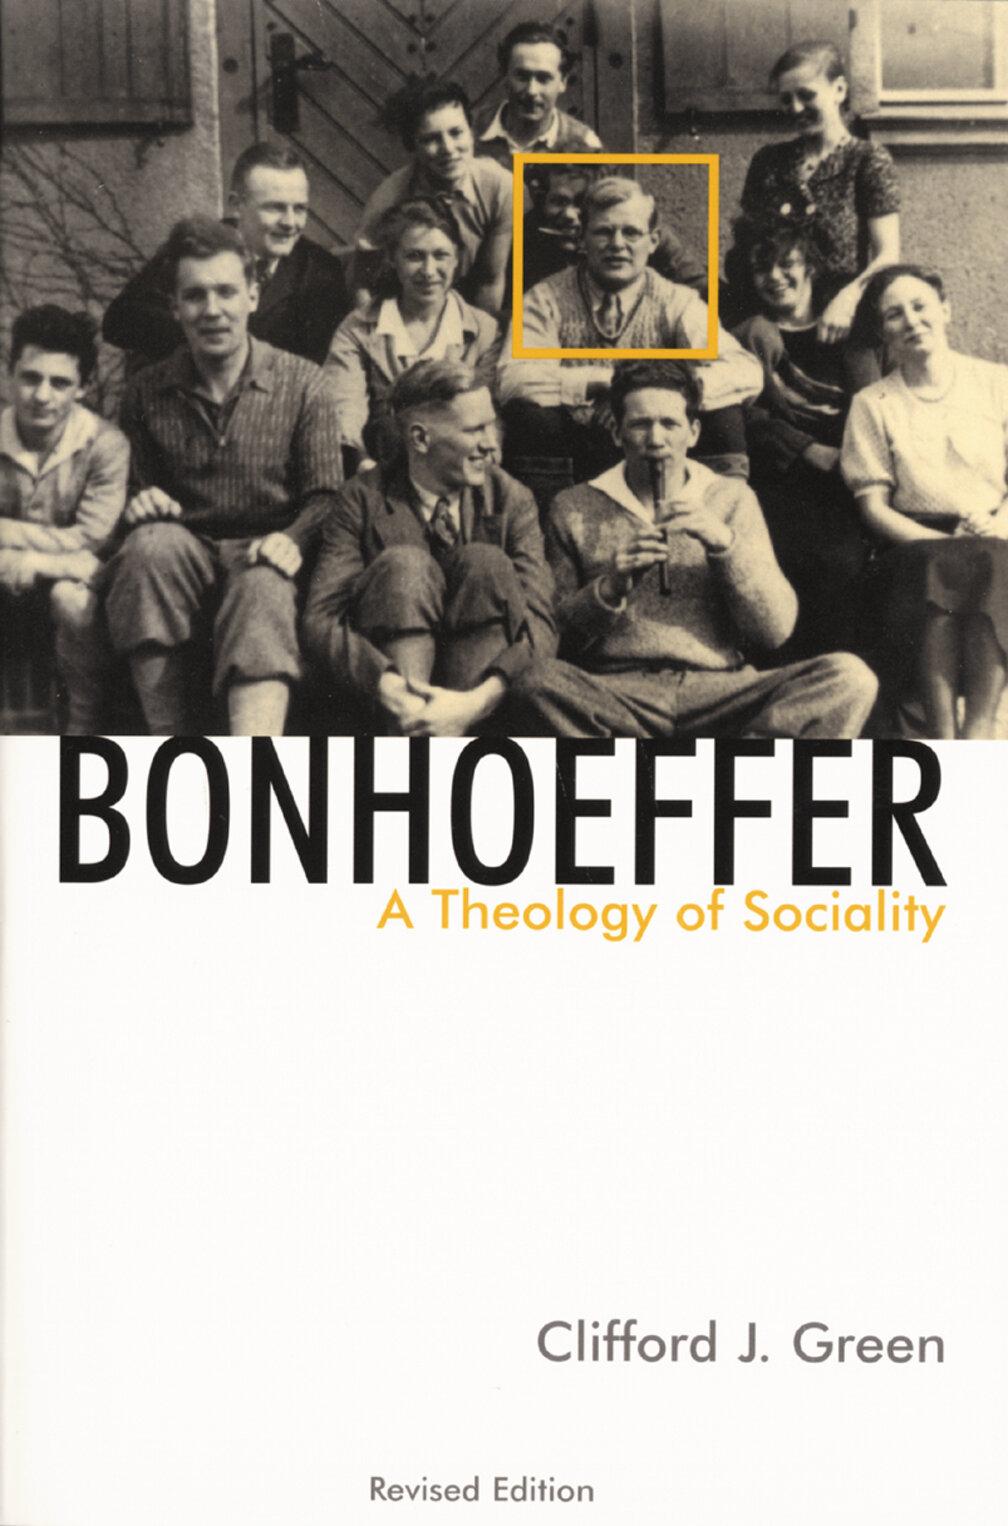 Bonhoeffer: A Theology of Sociality, Revised Edition